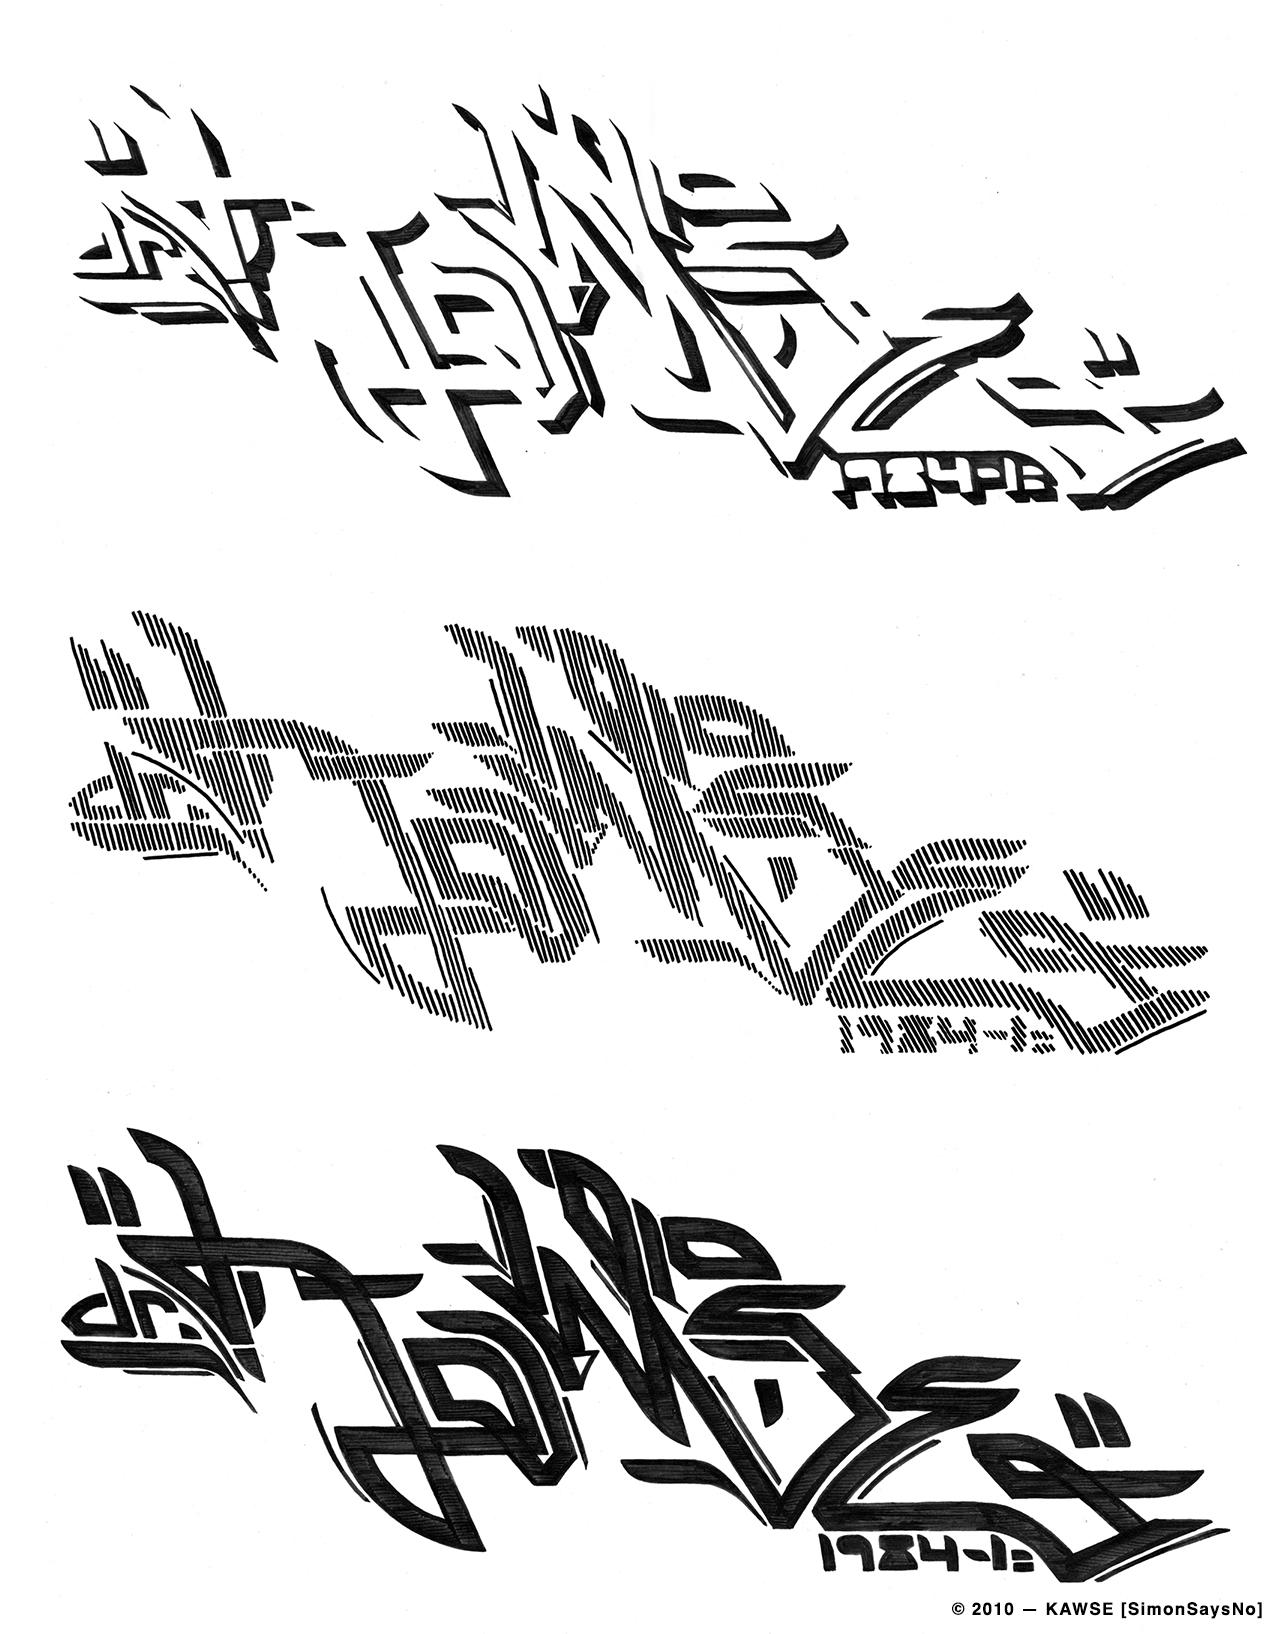 KAWSE 2010 — 1984-1= [3 Sketches]